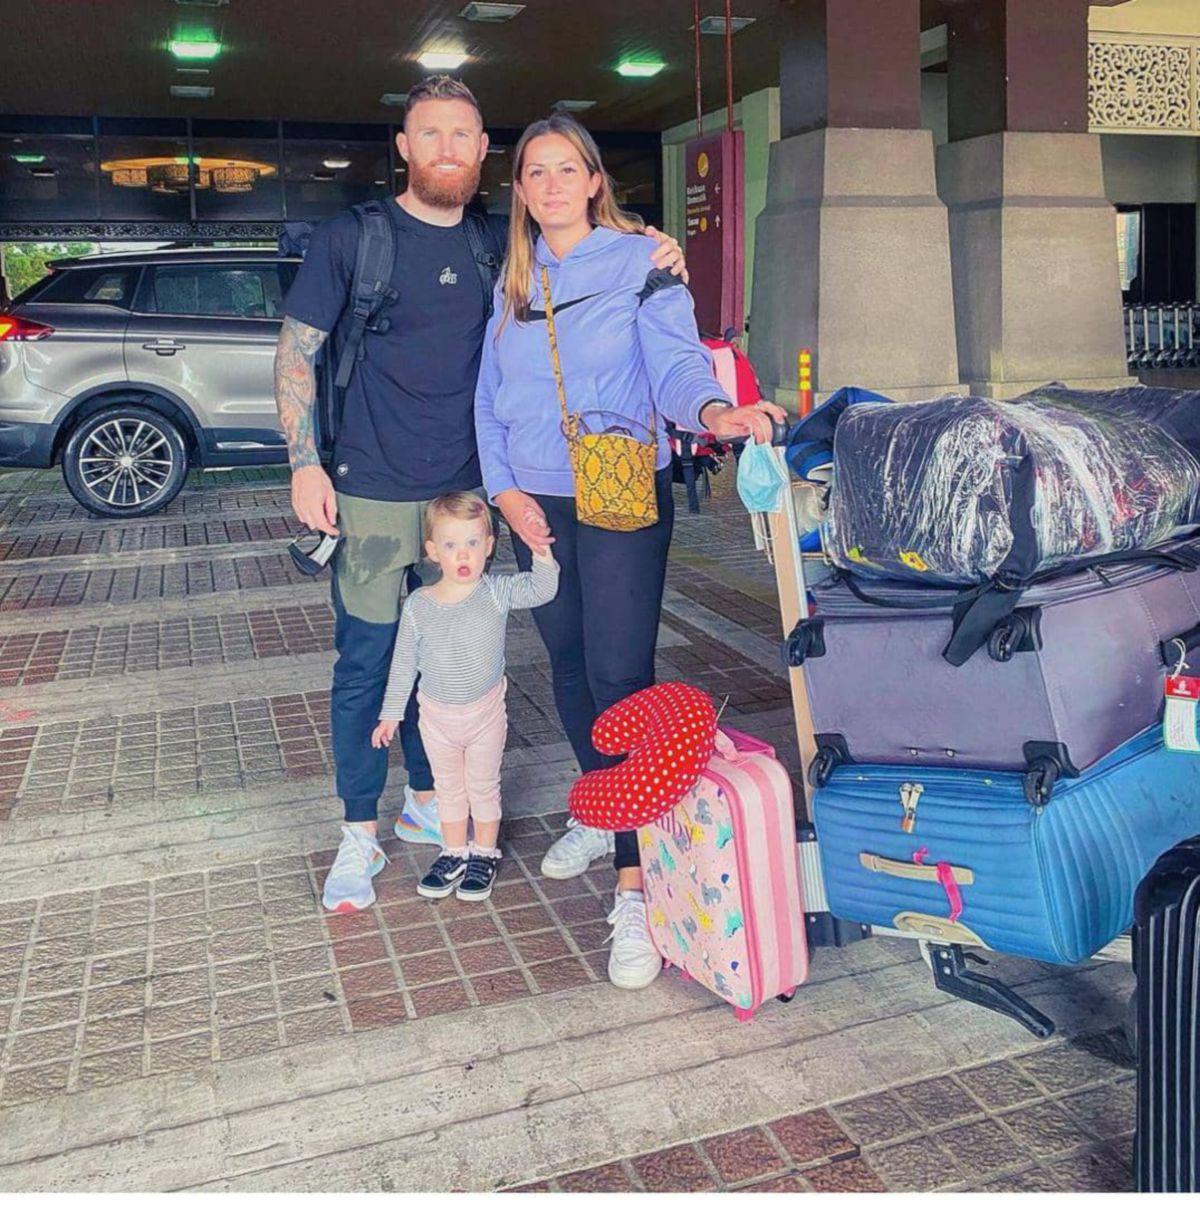 LEE Tuck bersama isteri dan anaknya bergambar kenangan di Lapangan Terbang Antarabangsa Sultan Mahmud sebelum pulang ke England Khamis lalu. FOTO ihsan Lee Tuck